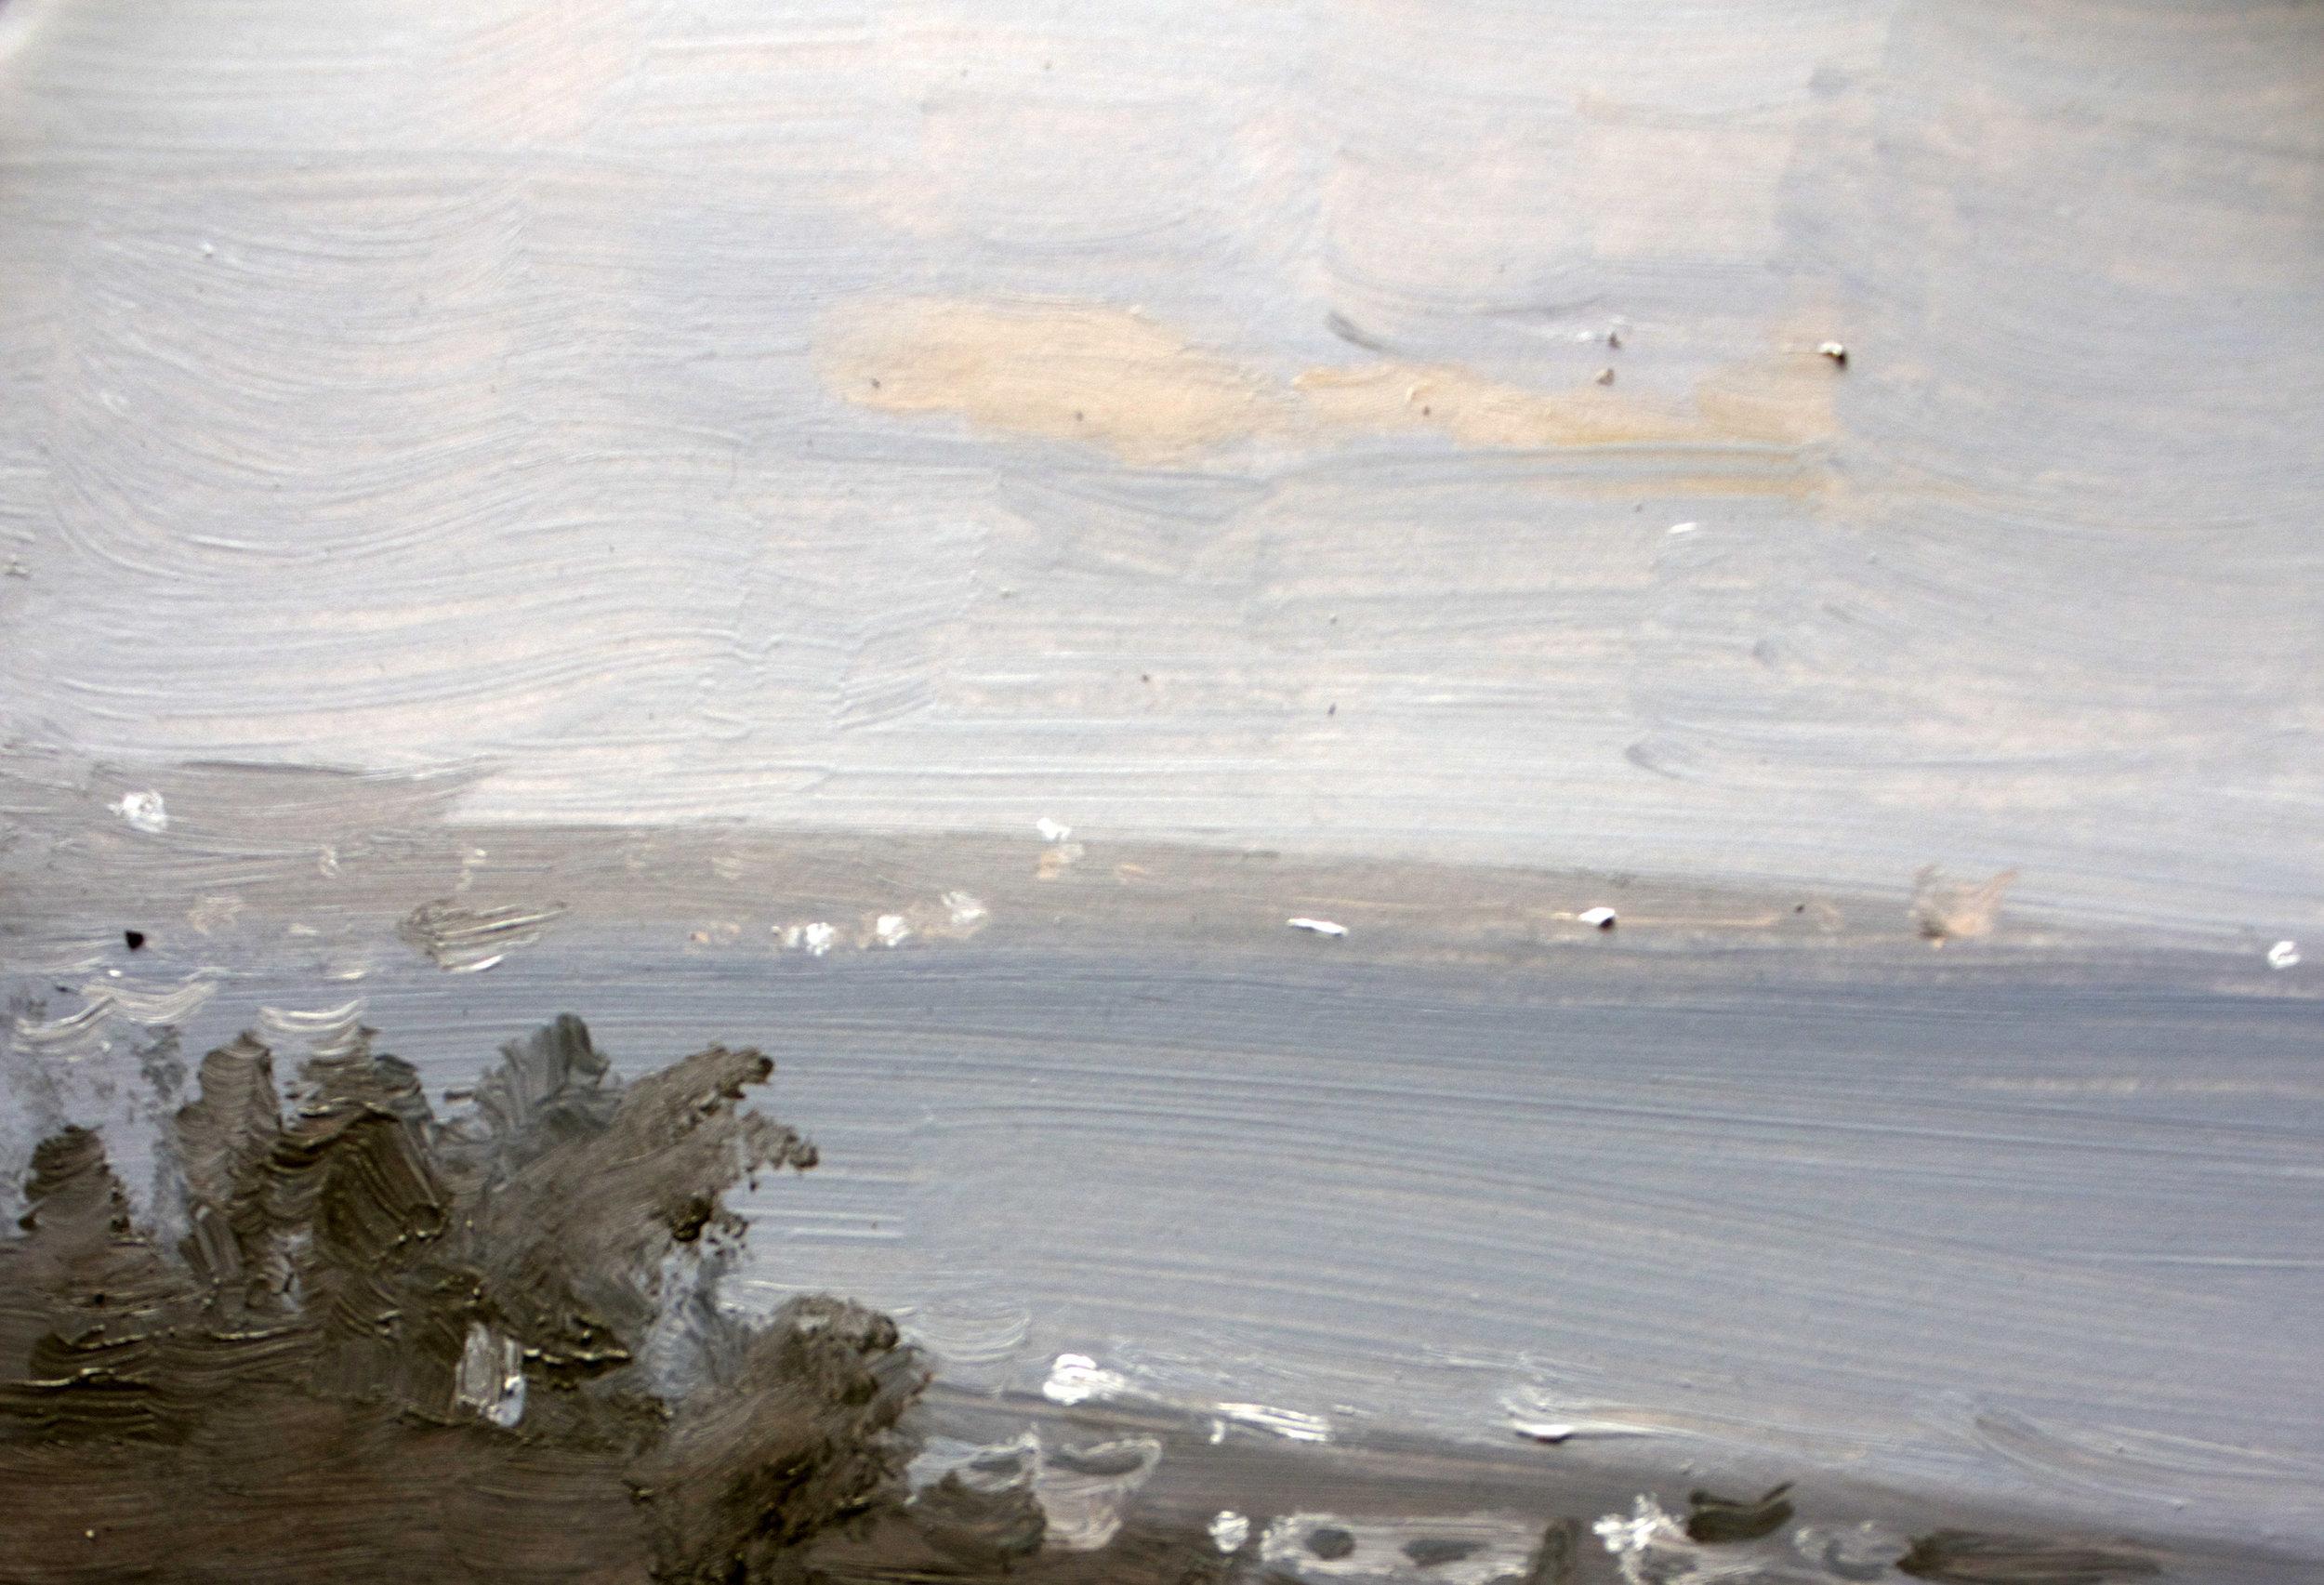 Yomitan balcony view - oil on panel, 5x7 in